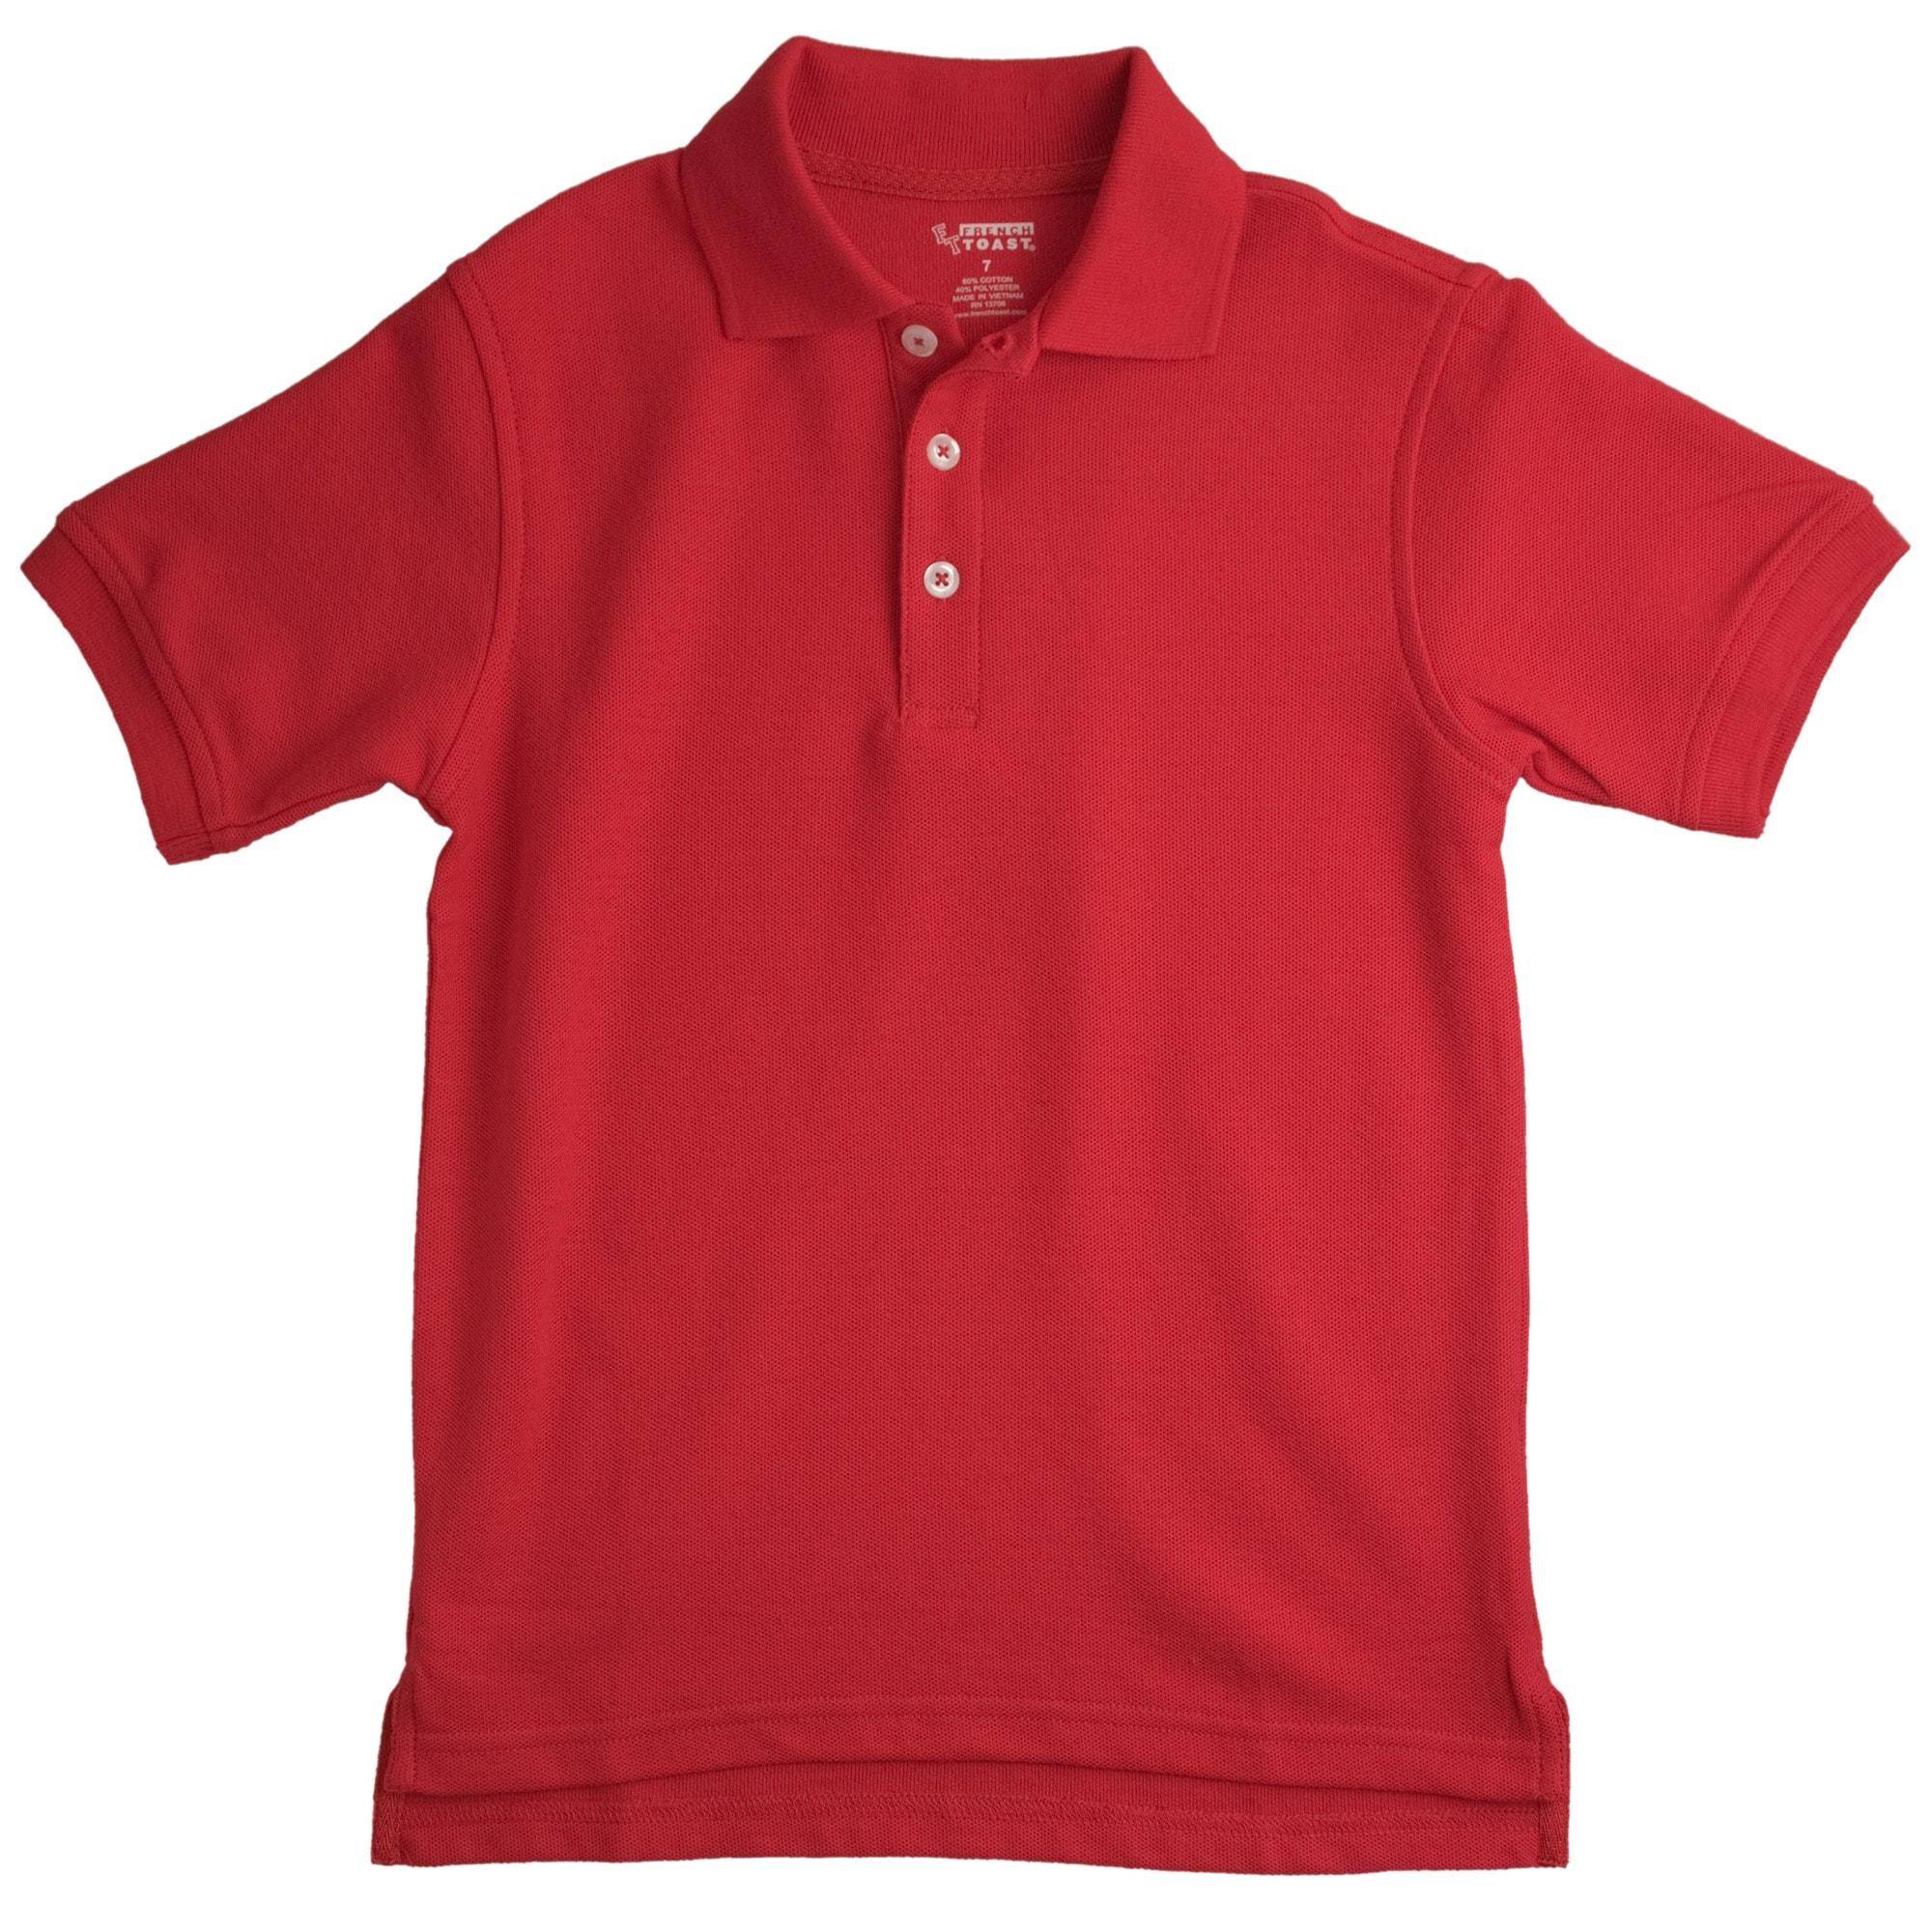 French Toast Boy's School Uniform Polo Size 14 (Set of 2)